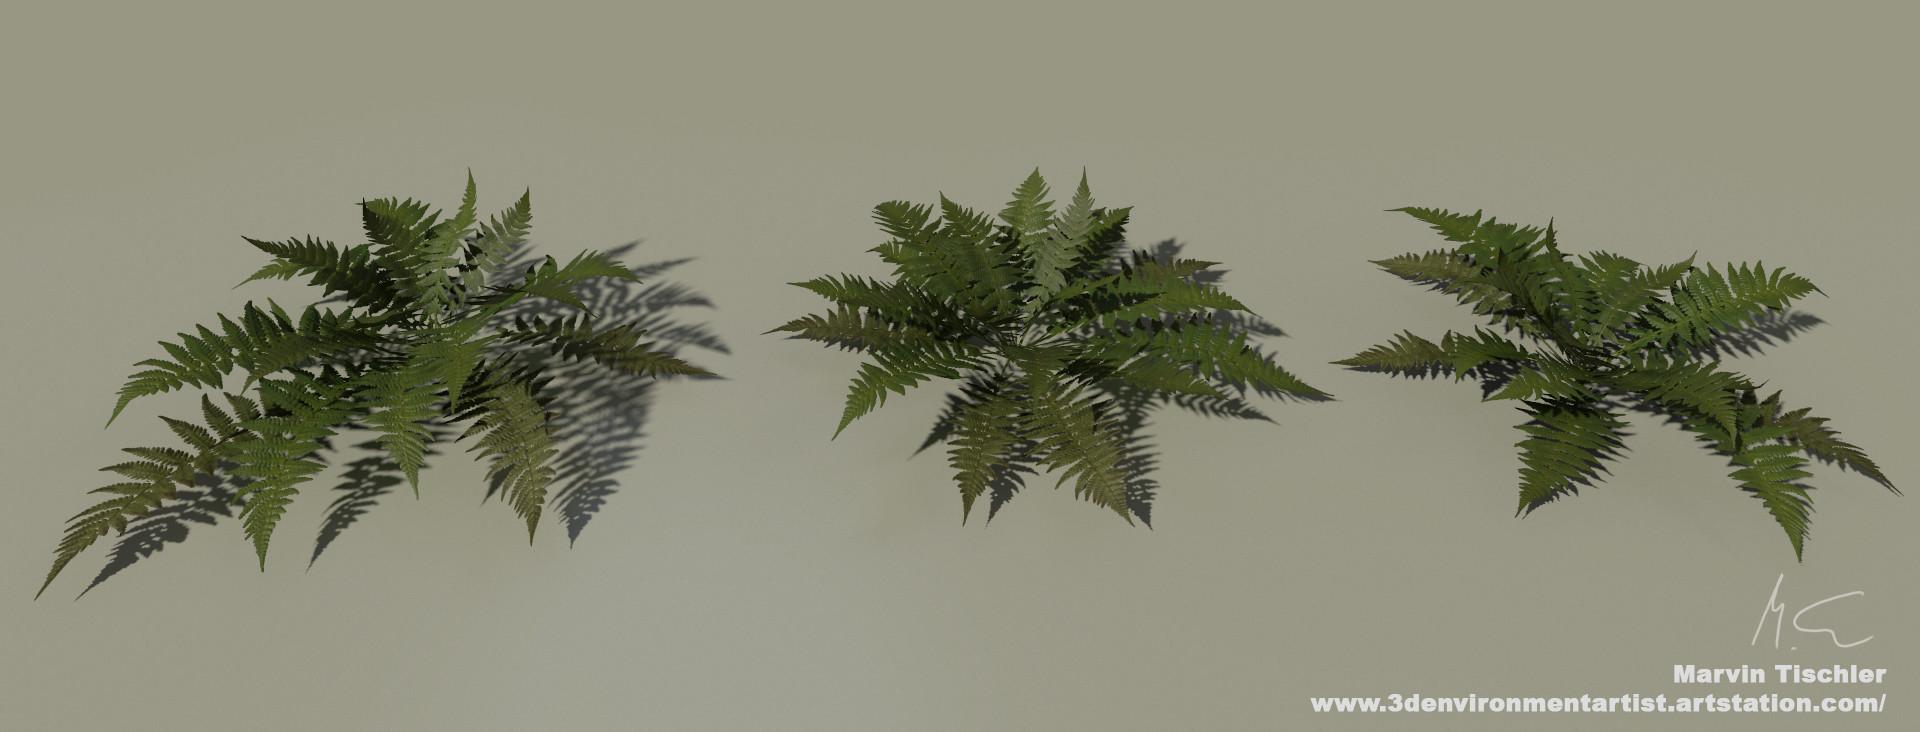 Marvin tischler plants 001 d